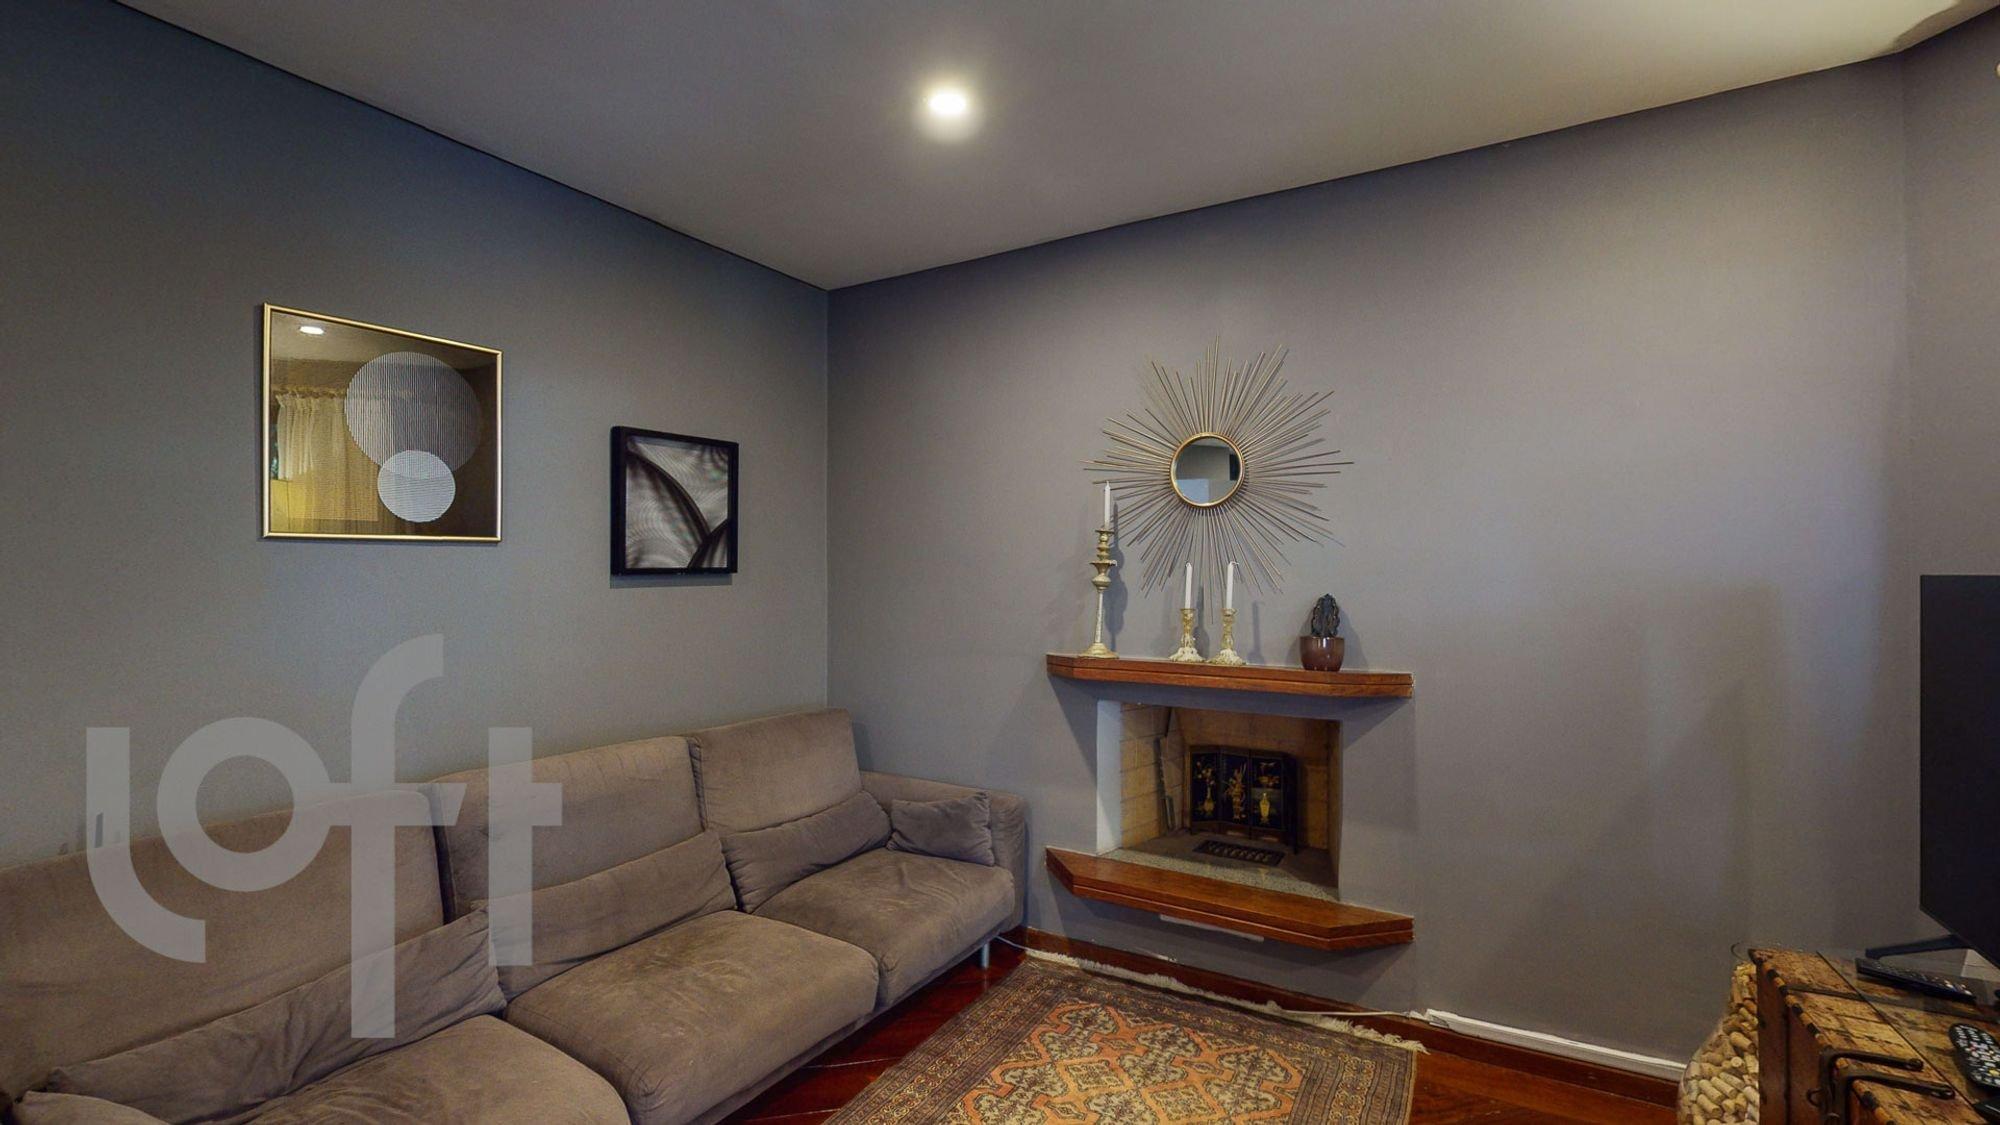 https://content.loft.com.br/homes/1mpfz46/desktop_living22.jpg